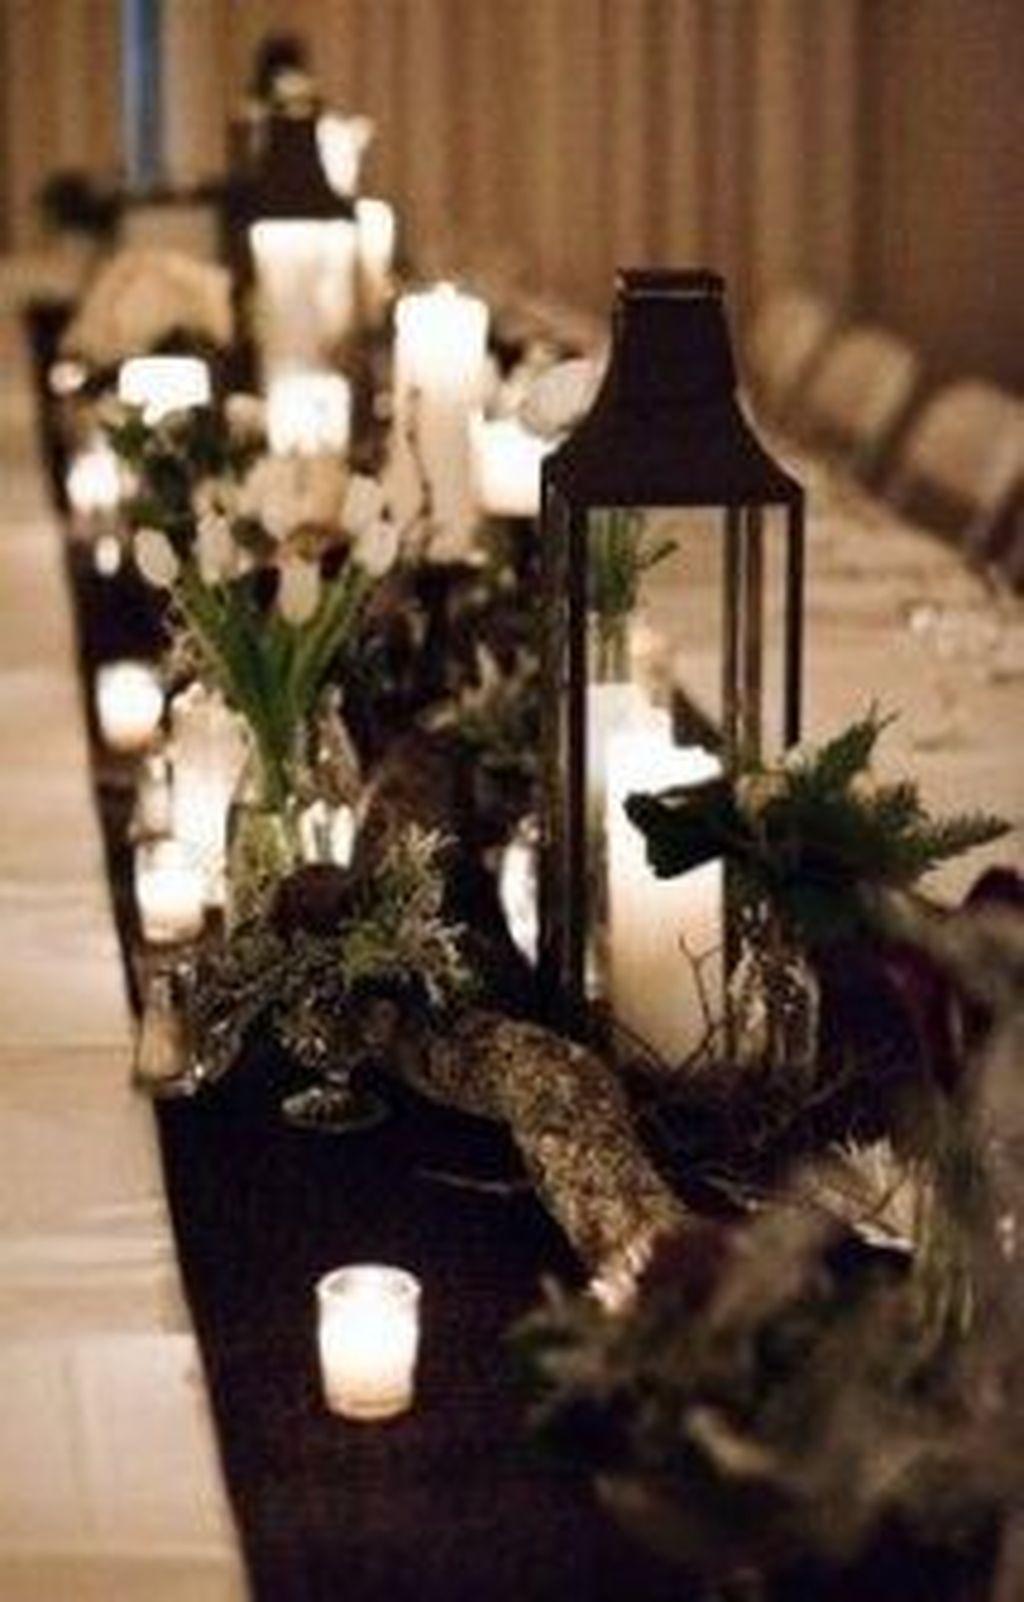 Fabulous Winter Lantern Centerpieces Ideas 22 Pimphomee